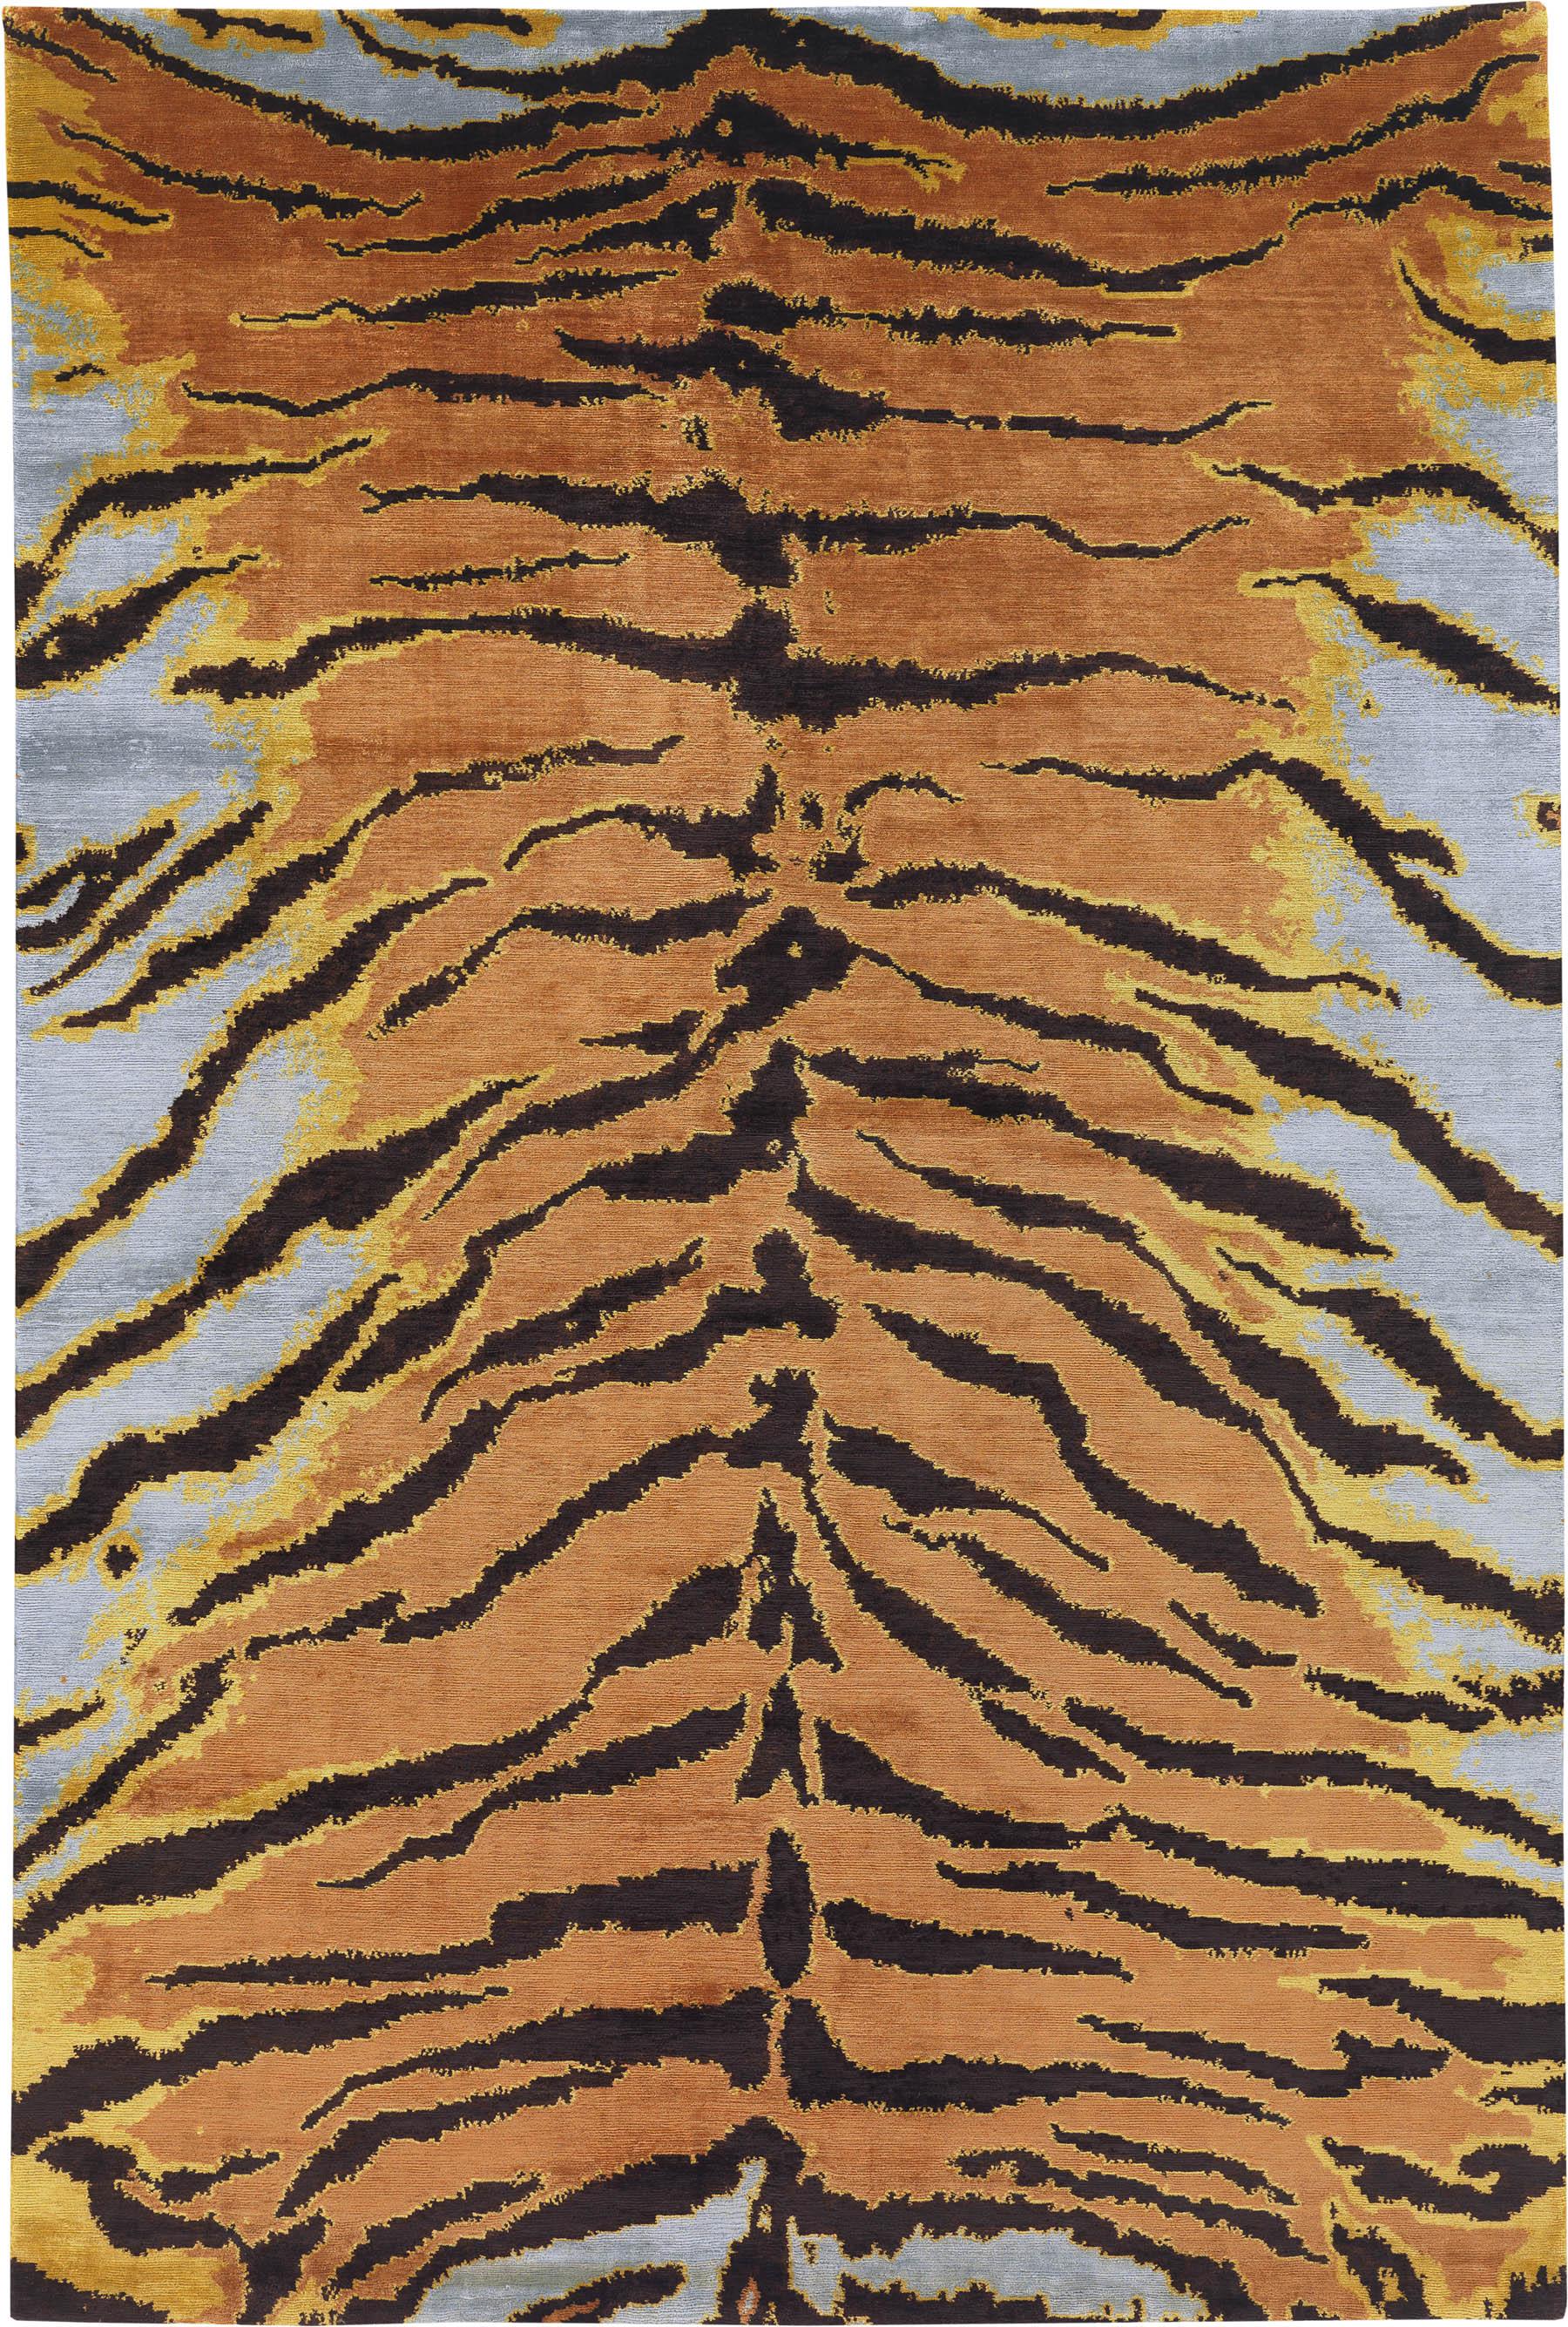 'Tiger' in colour 'Caramel' by Joseph Carini | Image courtesy of Joseph Carini.